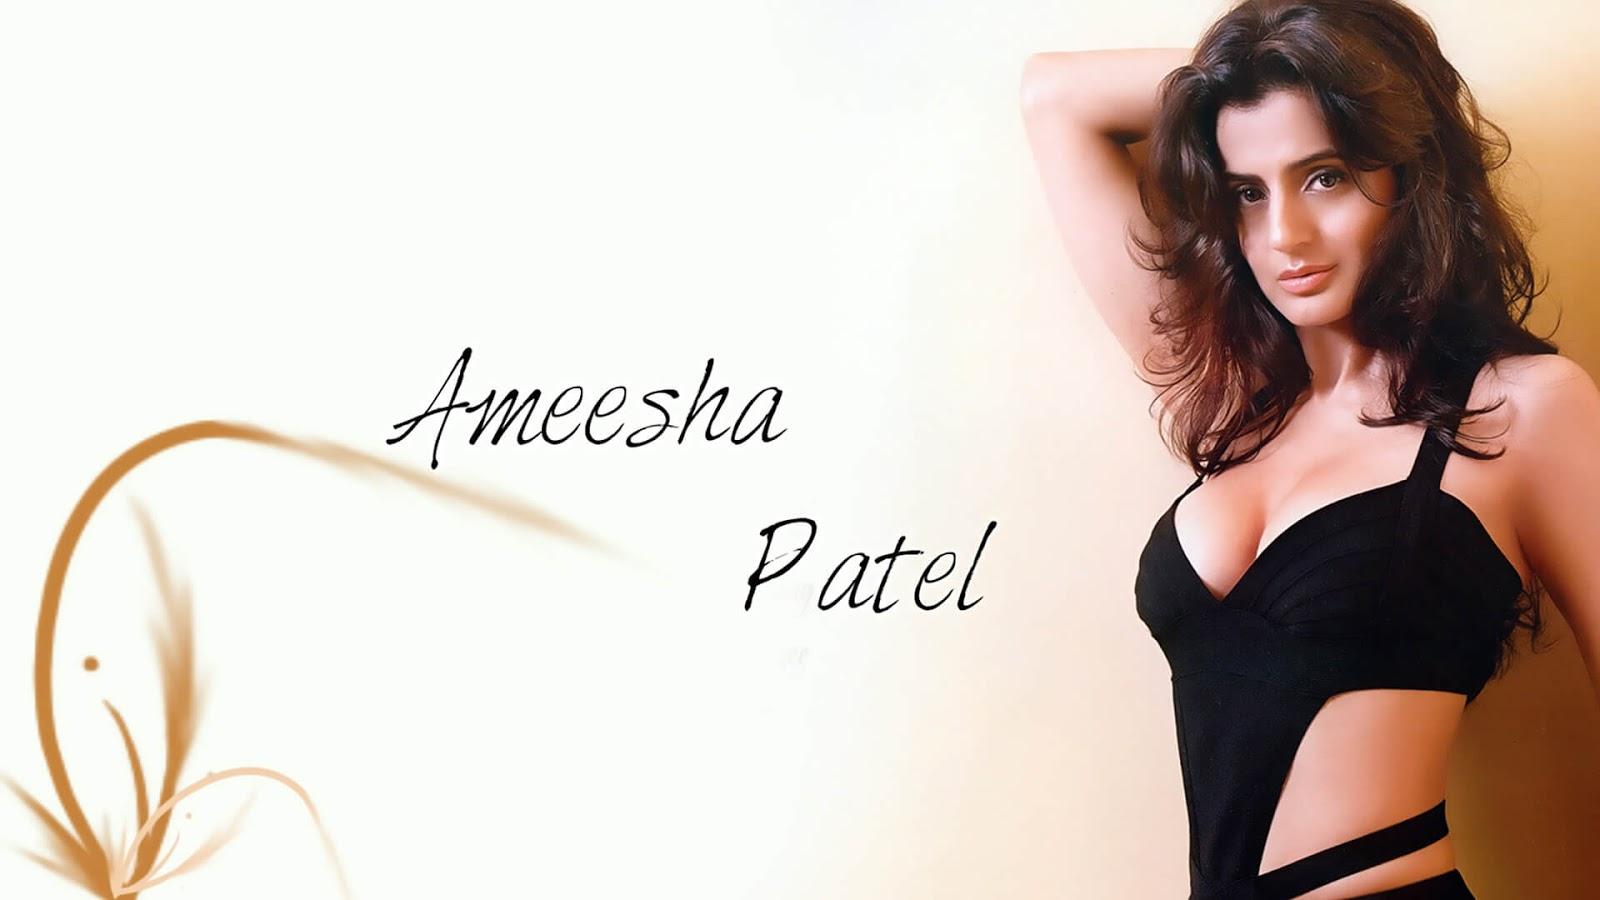 Amisha Patel Hot Wallpapers  Bikini Pics - Hd Images 1080P-8296